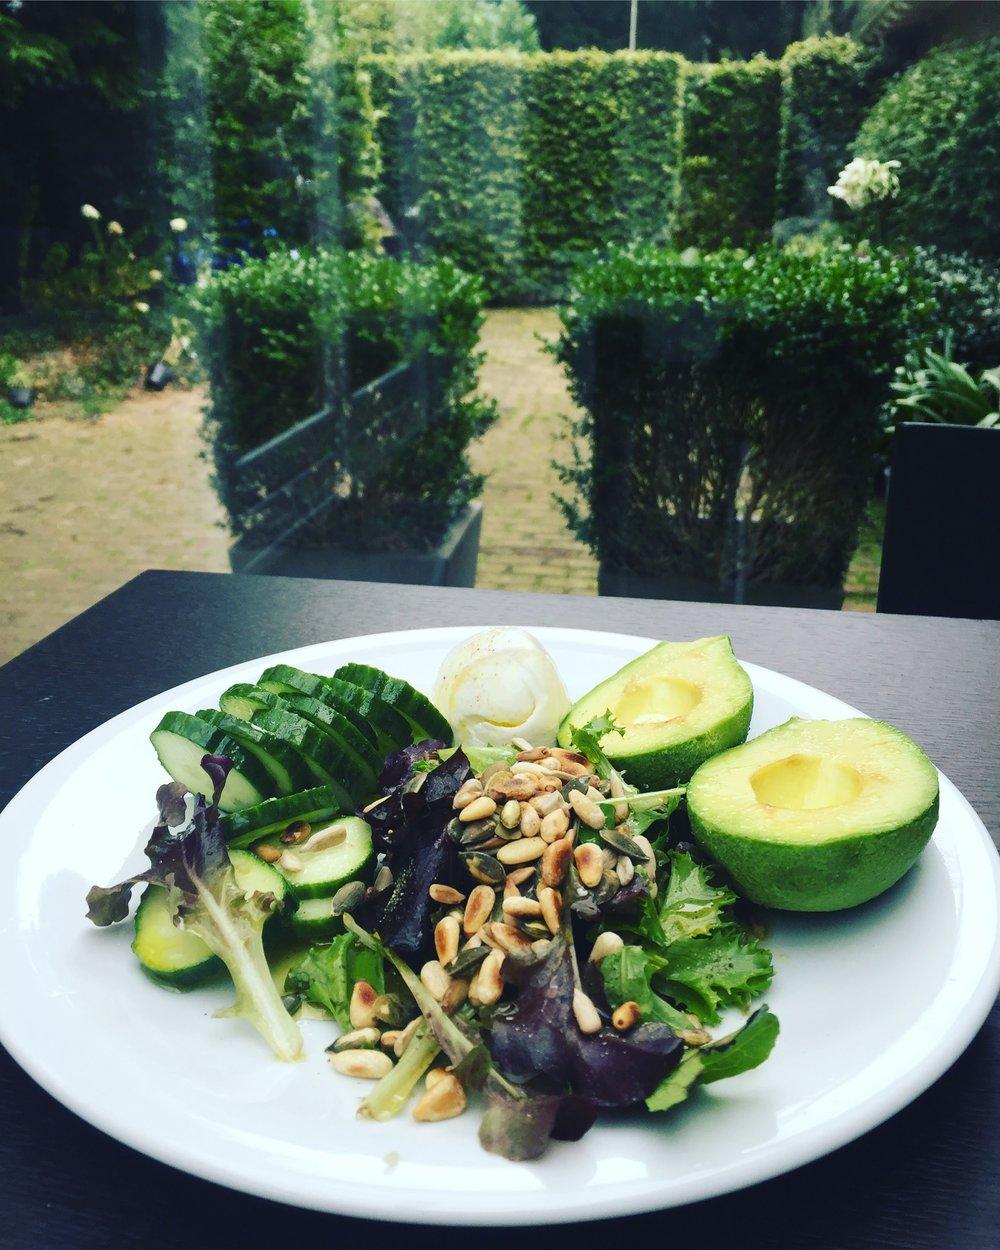 avocado and healthy fats carolina levie purefood.jpg